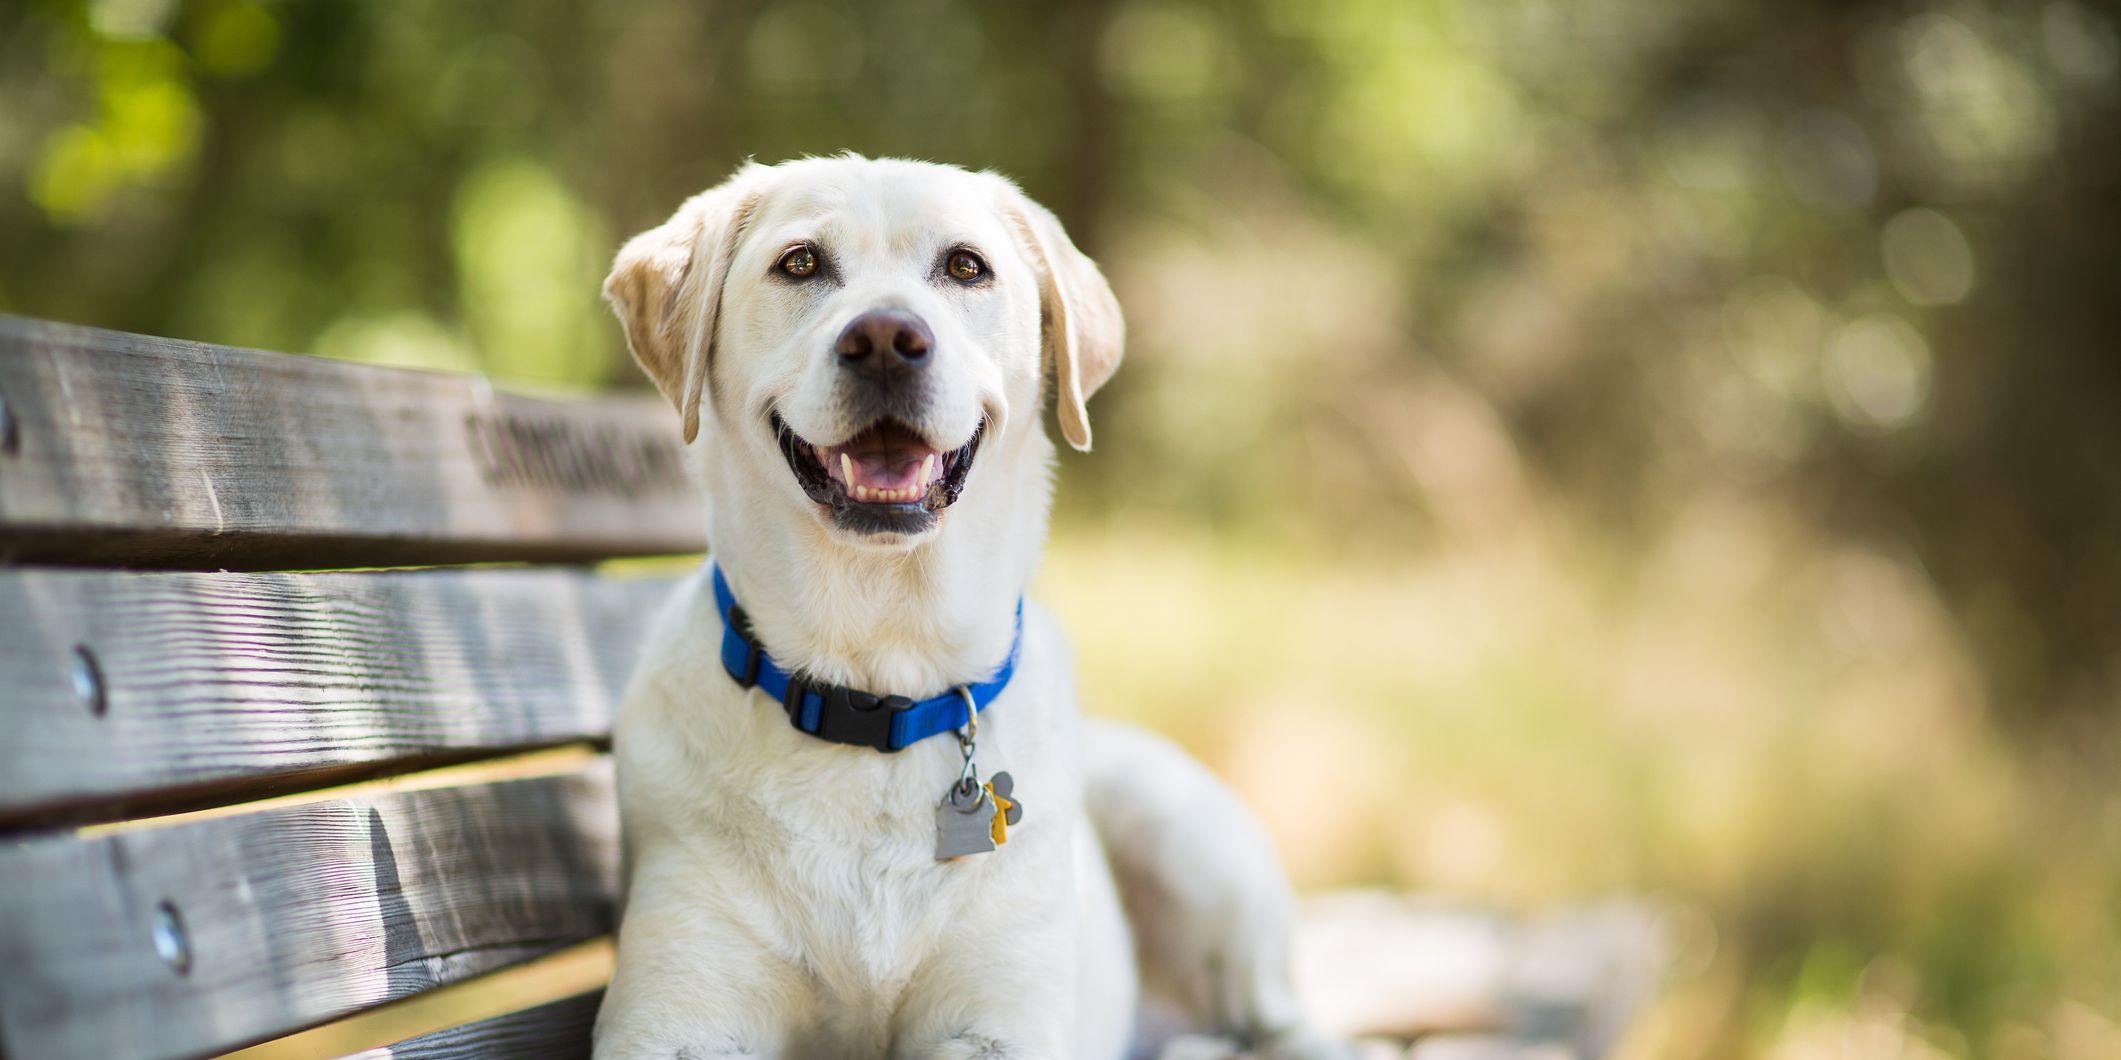 15 Best Dog Breeds For Travelers